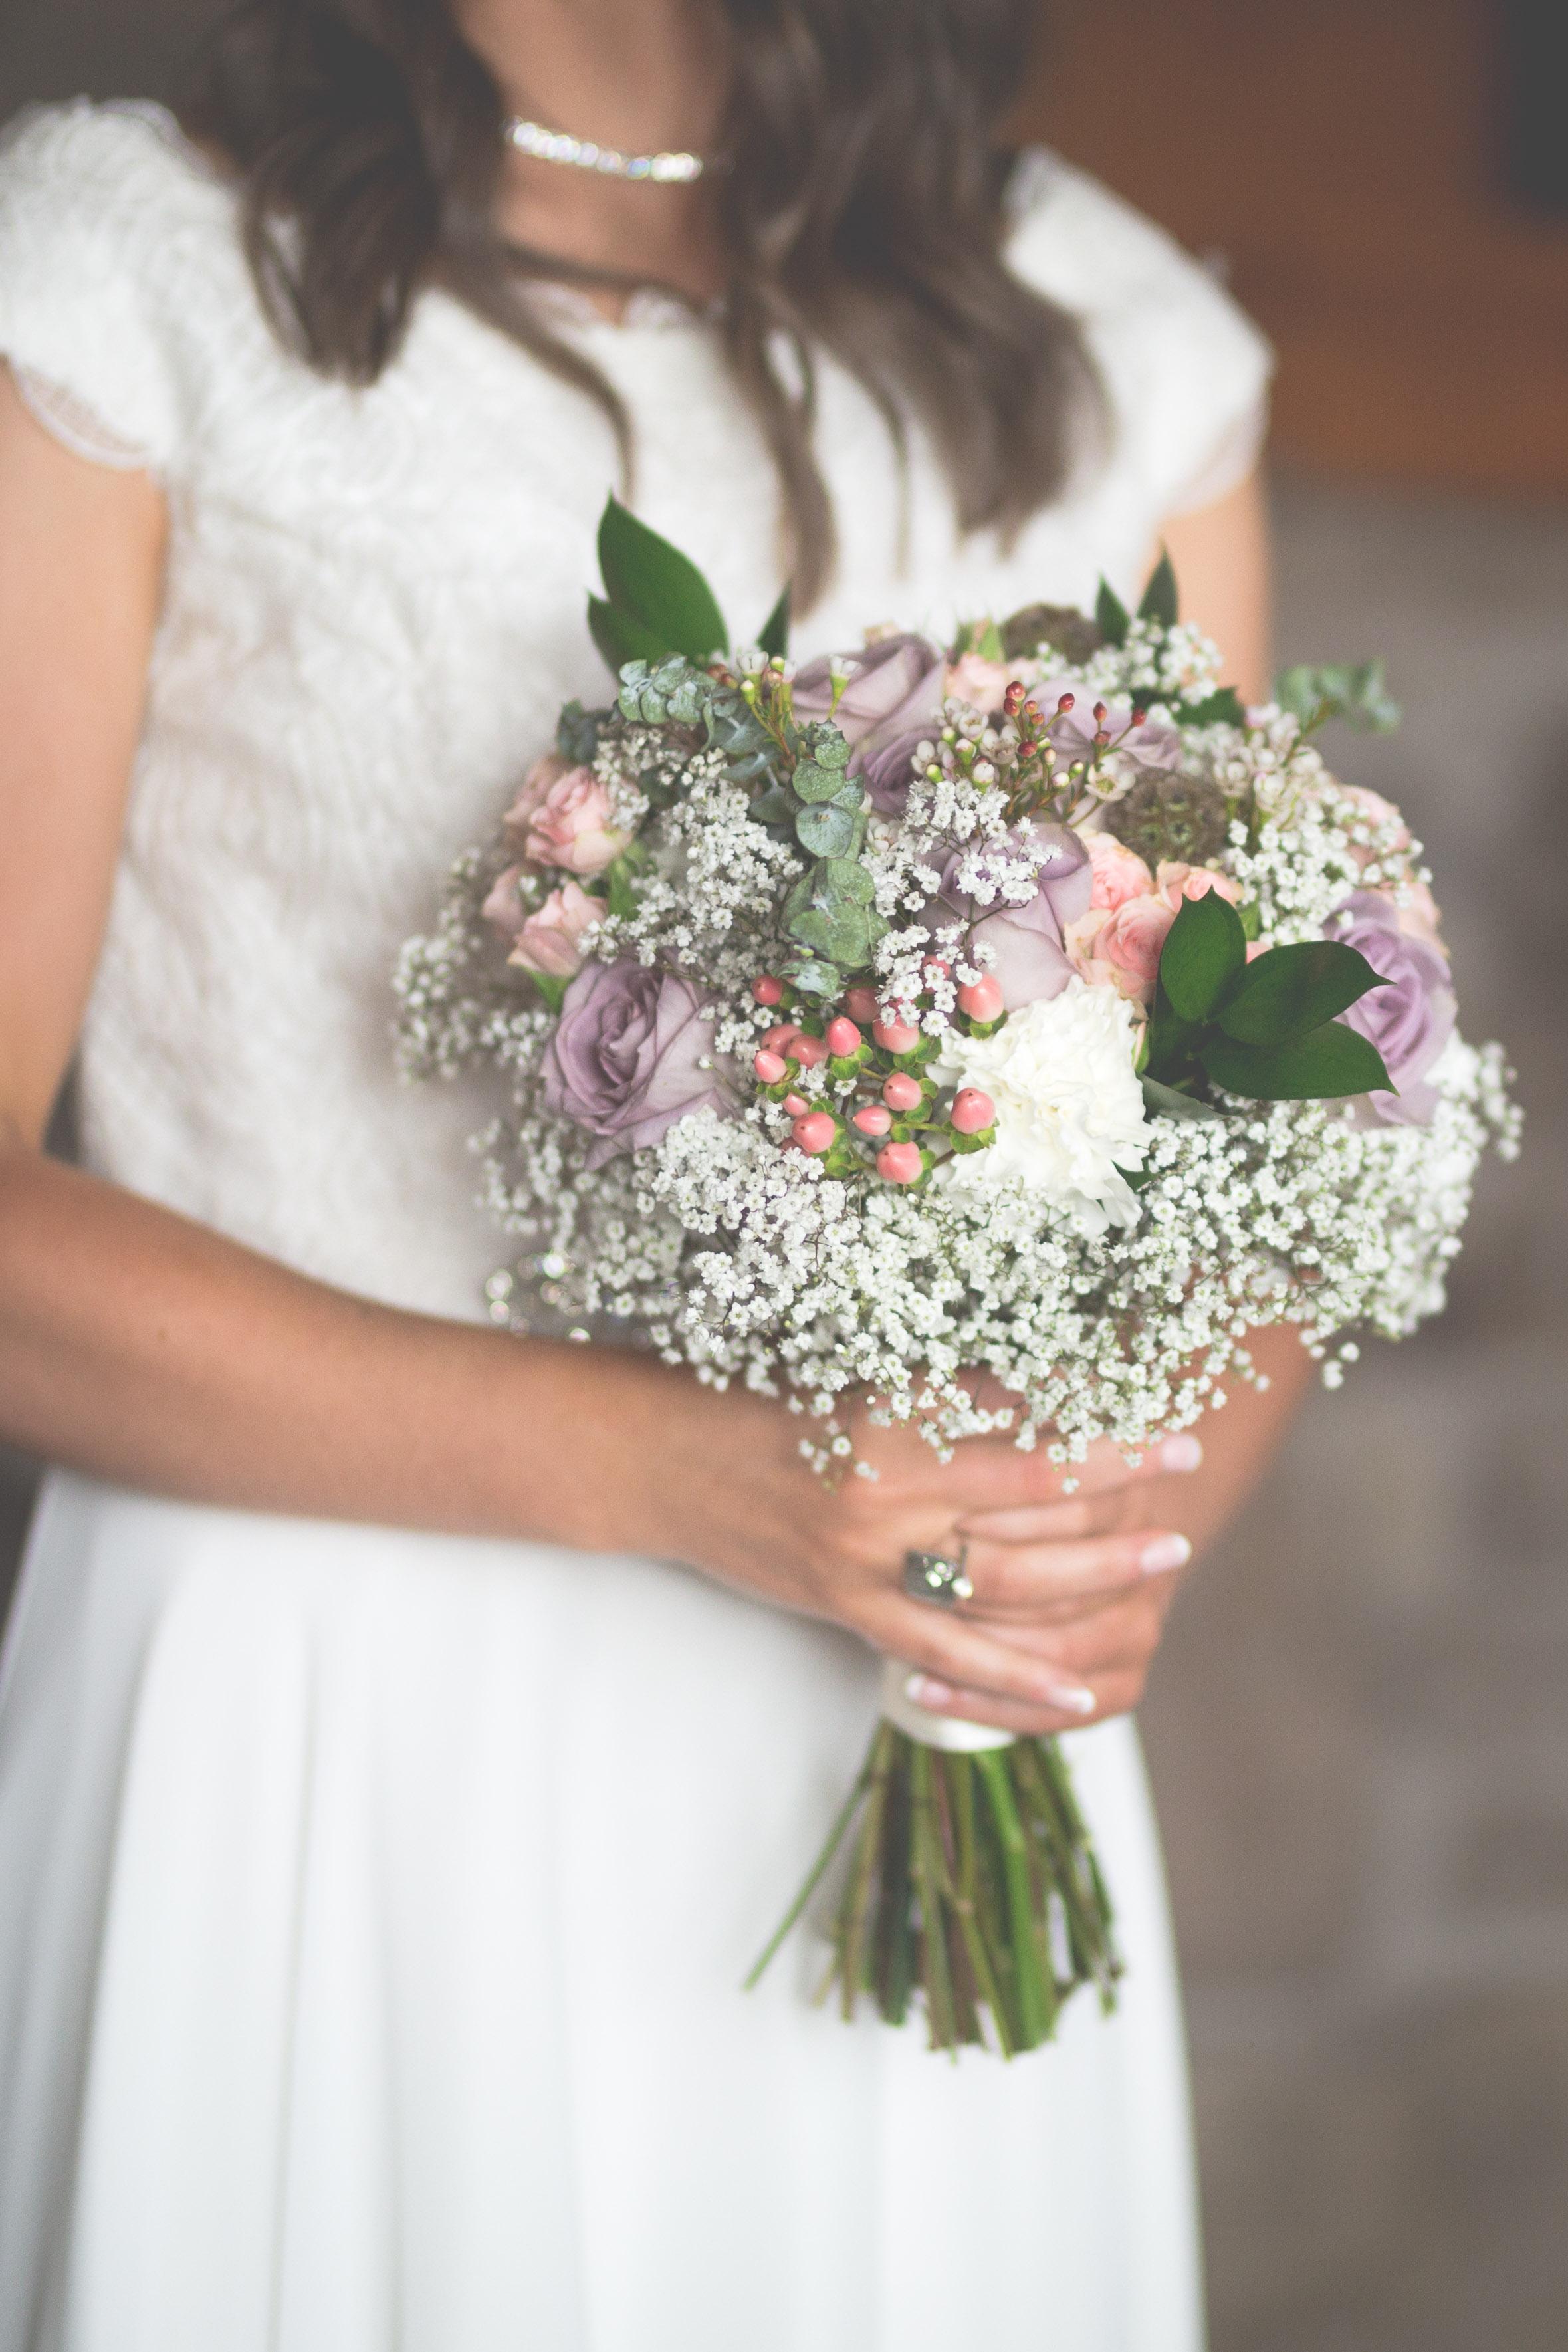 Northern Ireland Wedding Photographer | Brian McEwan Photography | Affordable Wedding Photography Throughout Antrim Down Armagh Tyrone Londonderry Derry Down Fermanagh -1.jpg